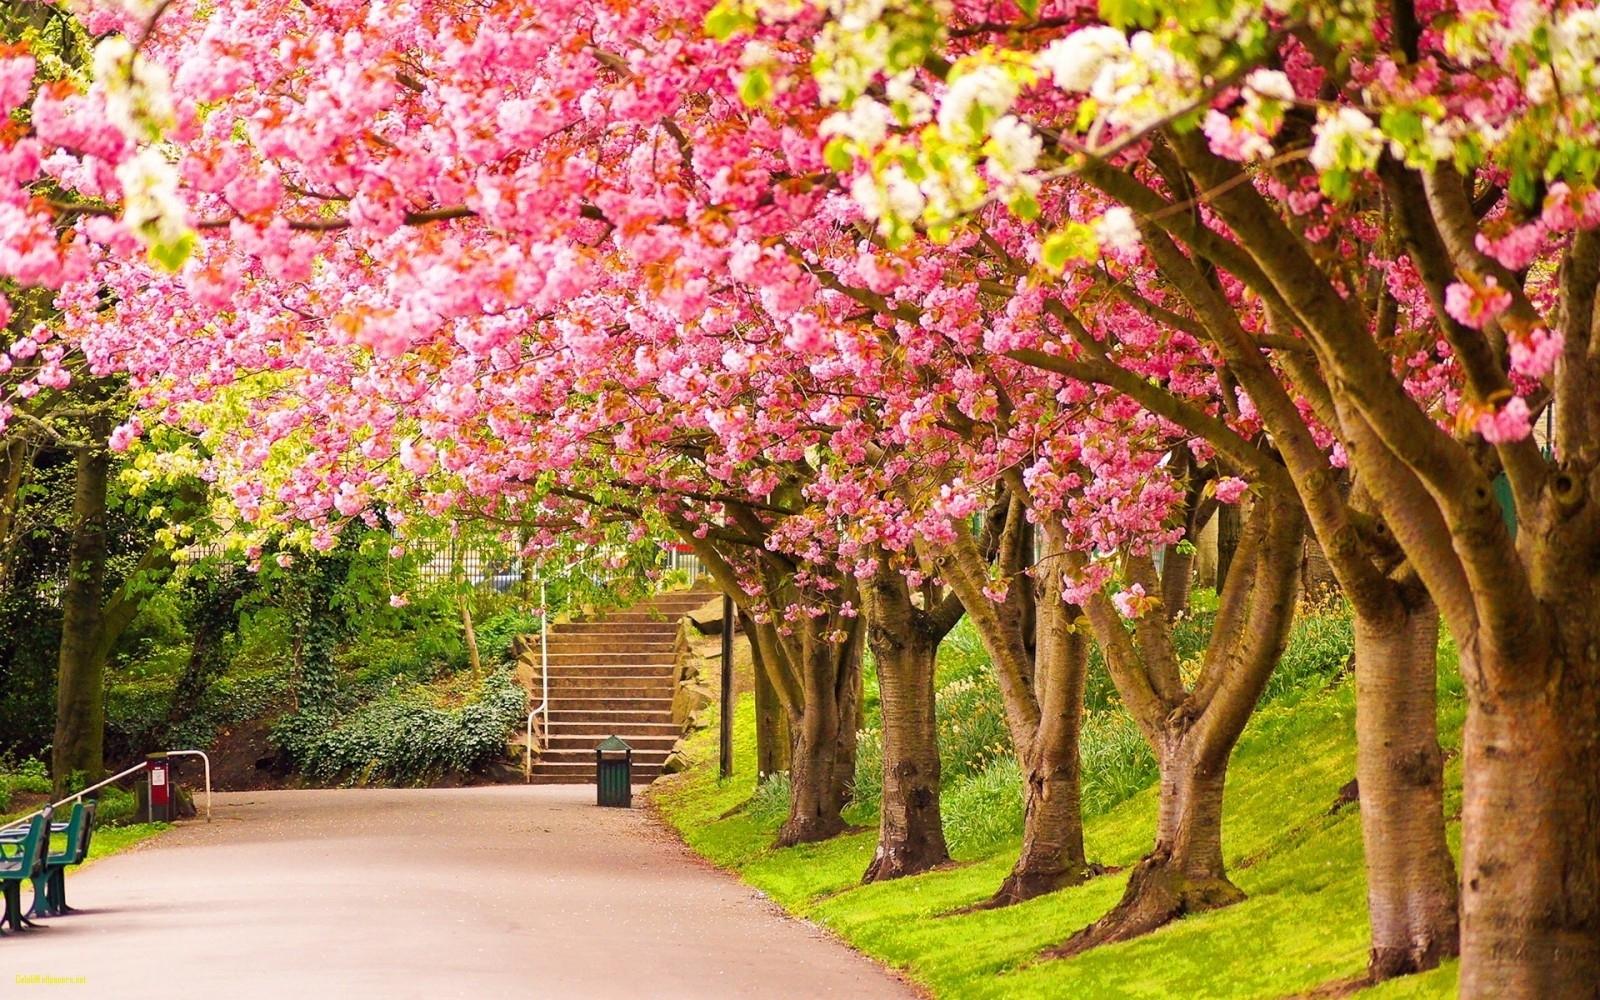 spring nature desktop wallpaper bunga pinterest nature desktop